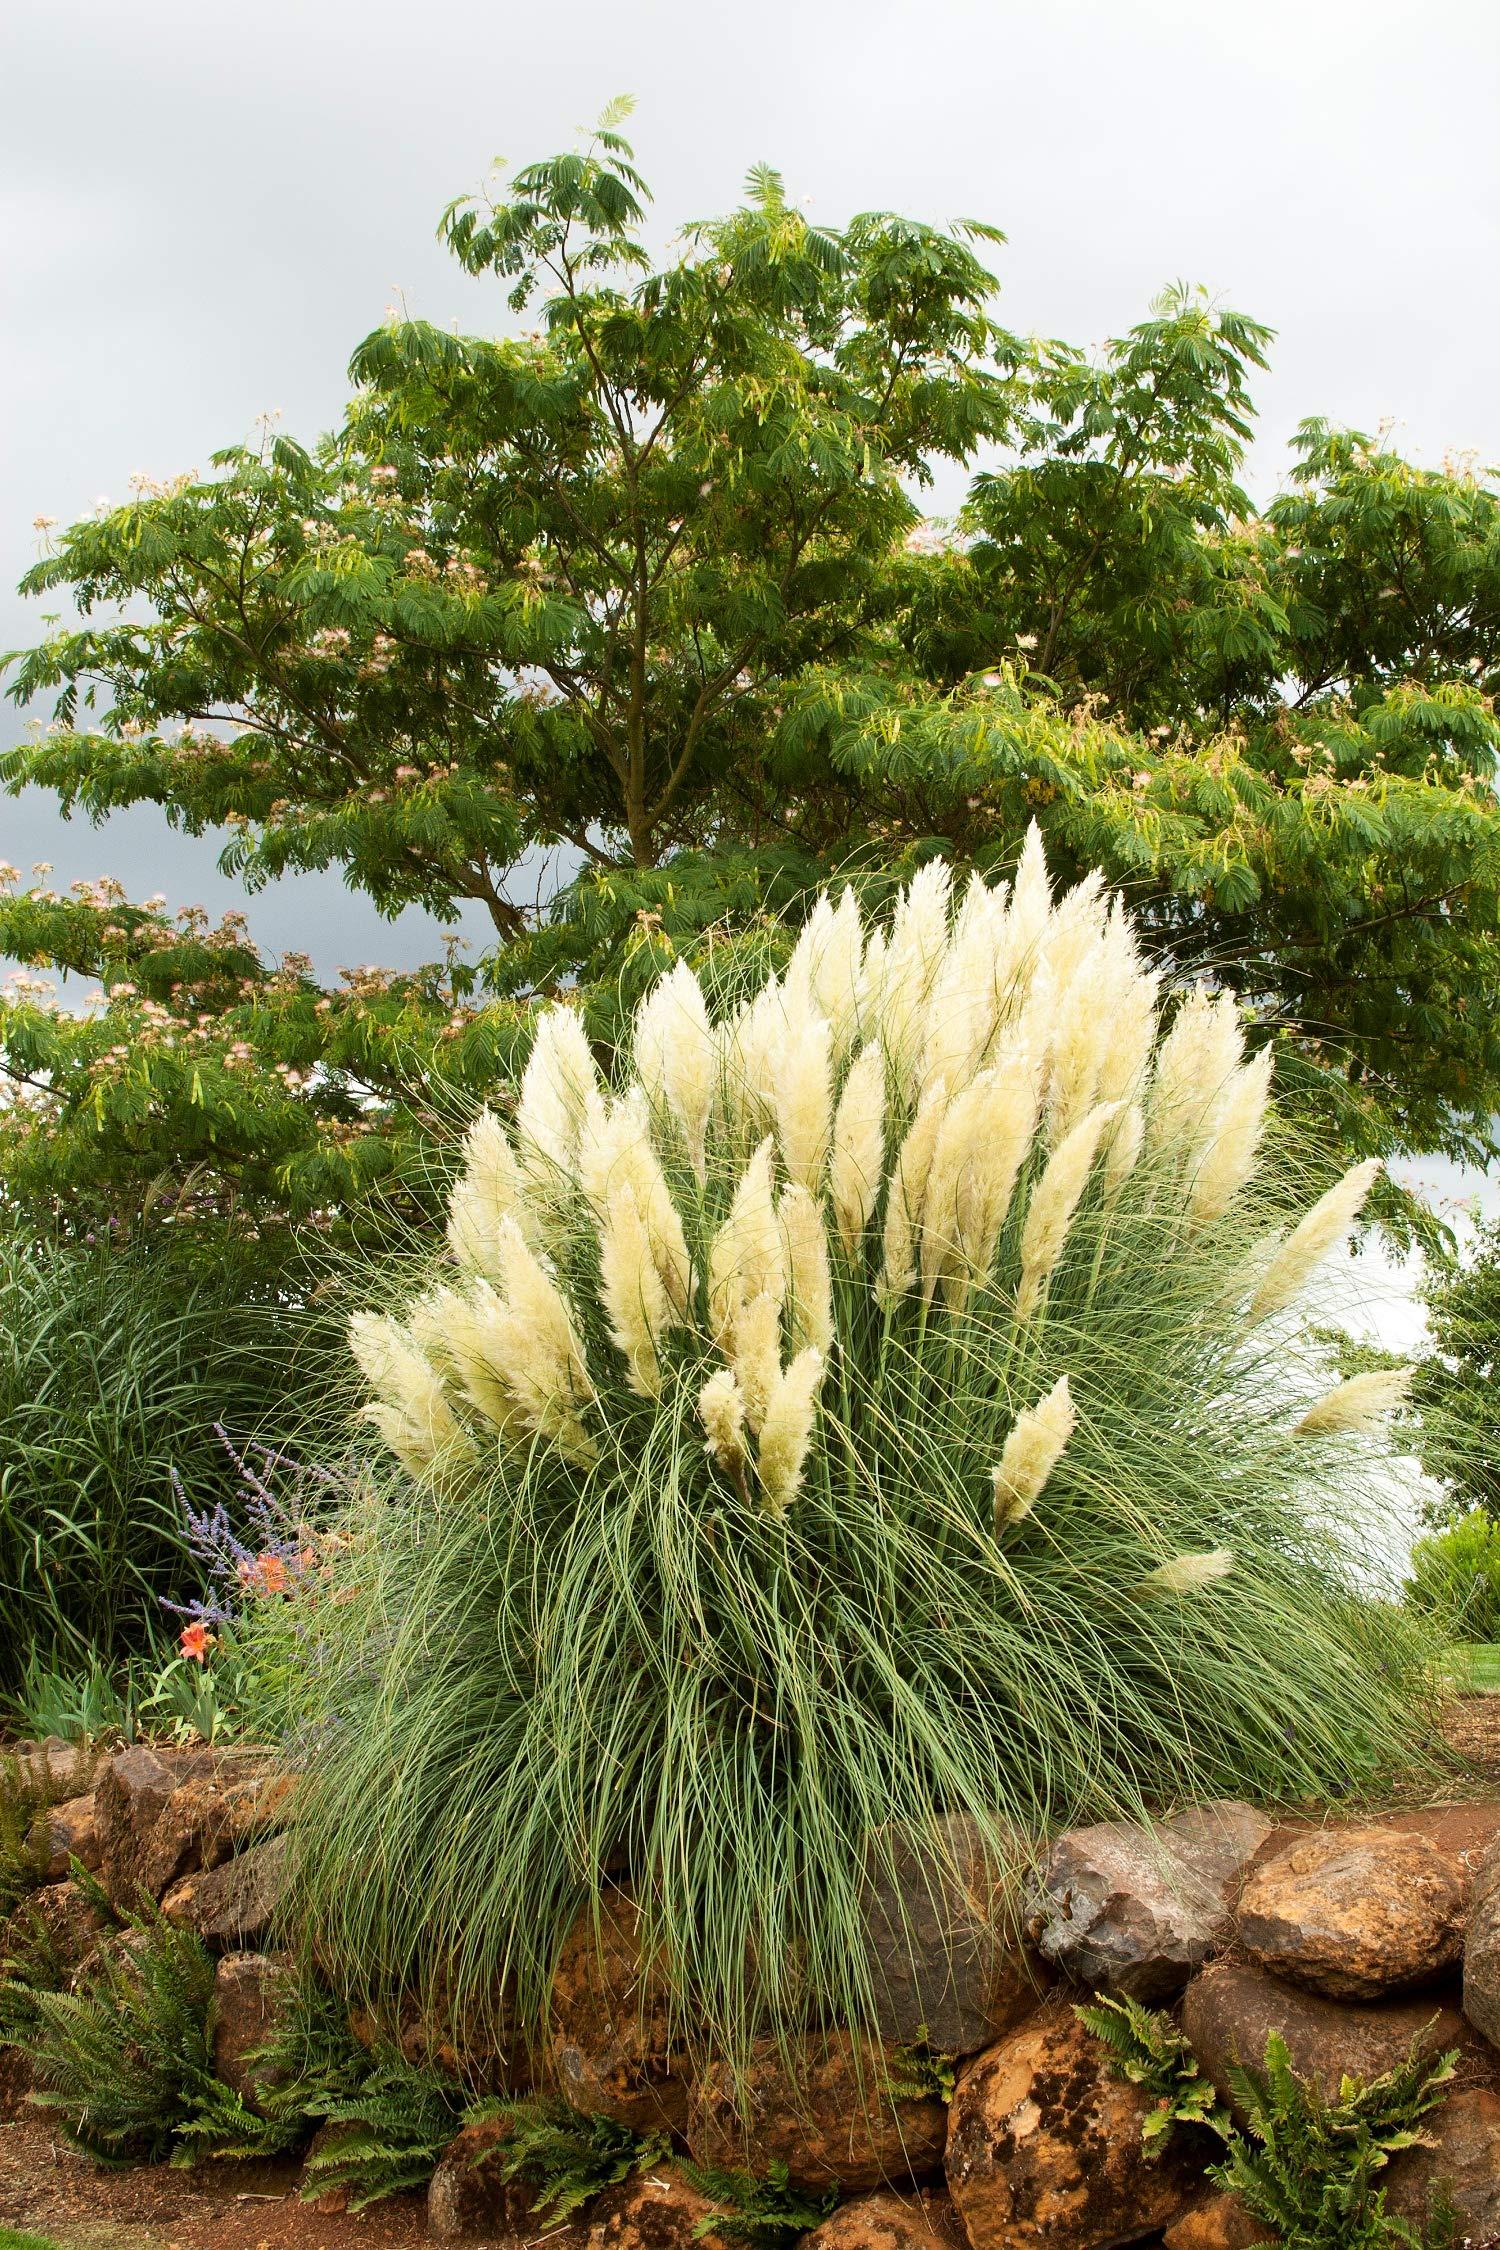 Pampas Grass Qty 15 Live Plants Cortaderia Selloana Showy Blooms by Florida Foliage (Image #7)